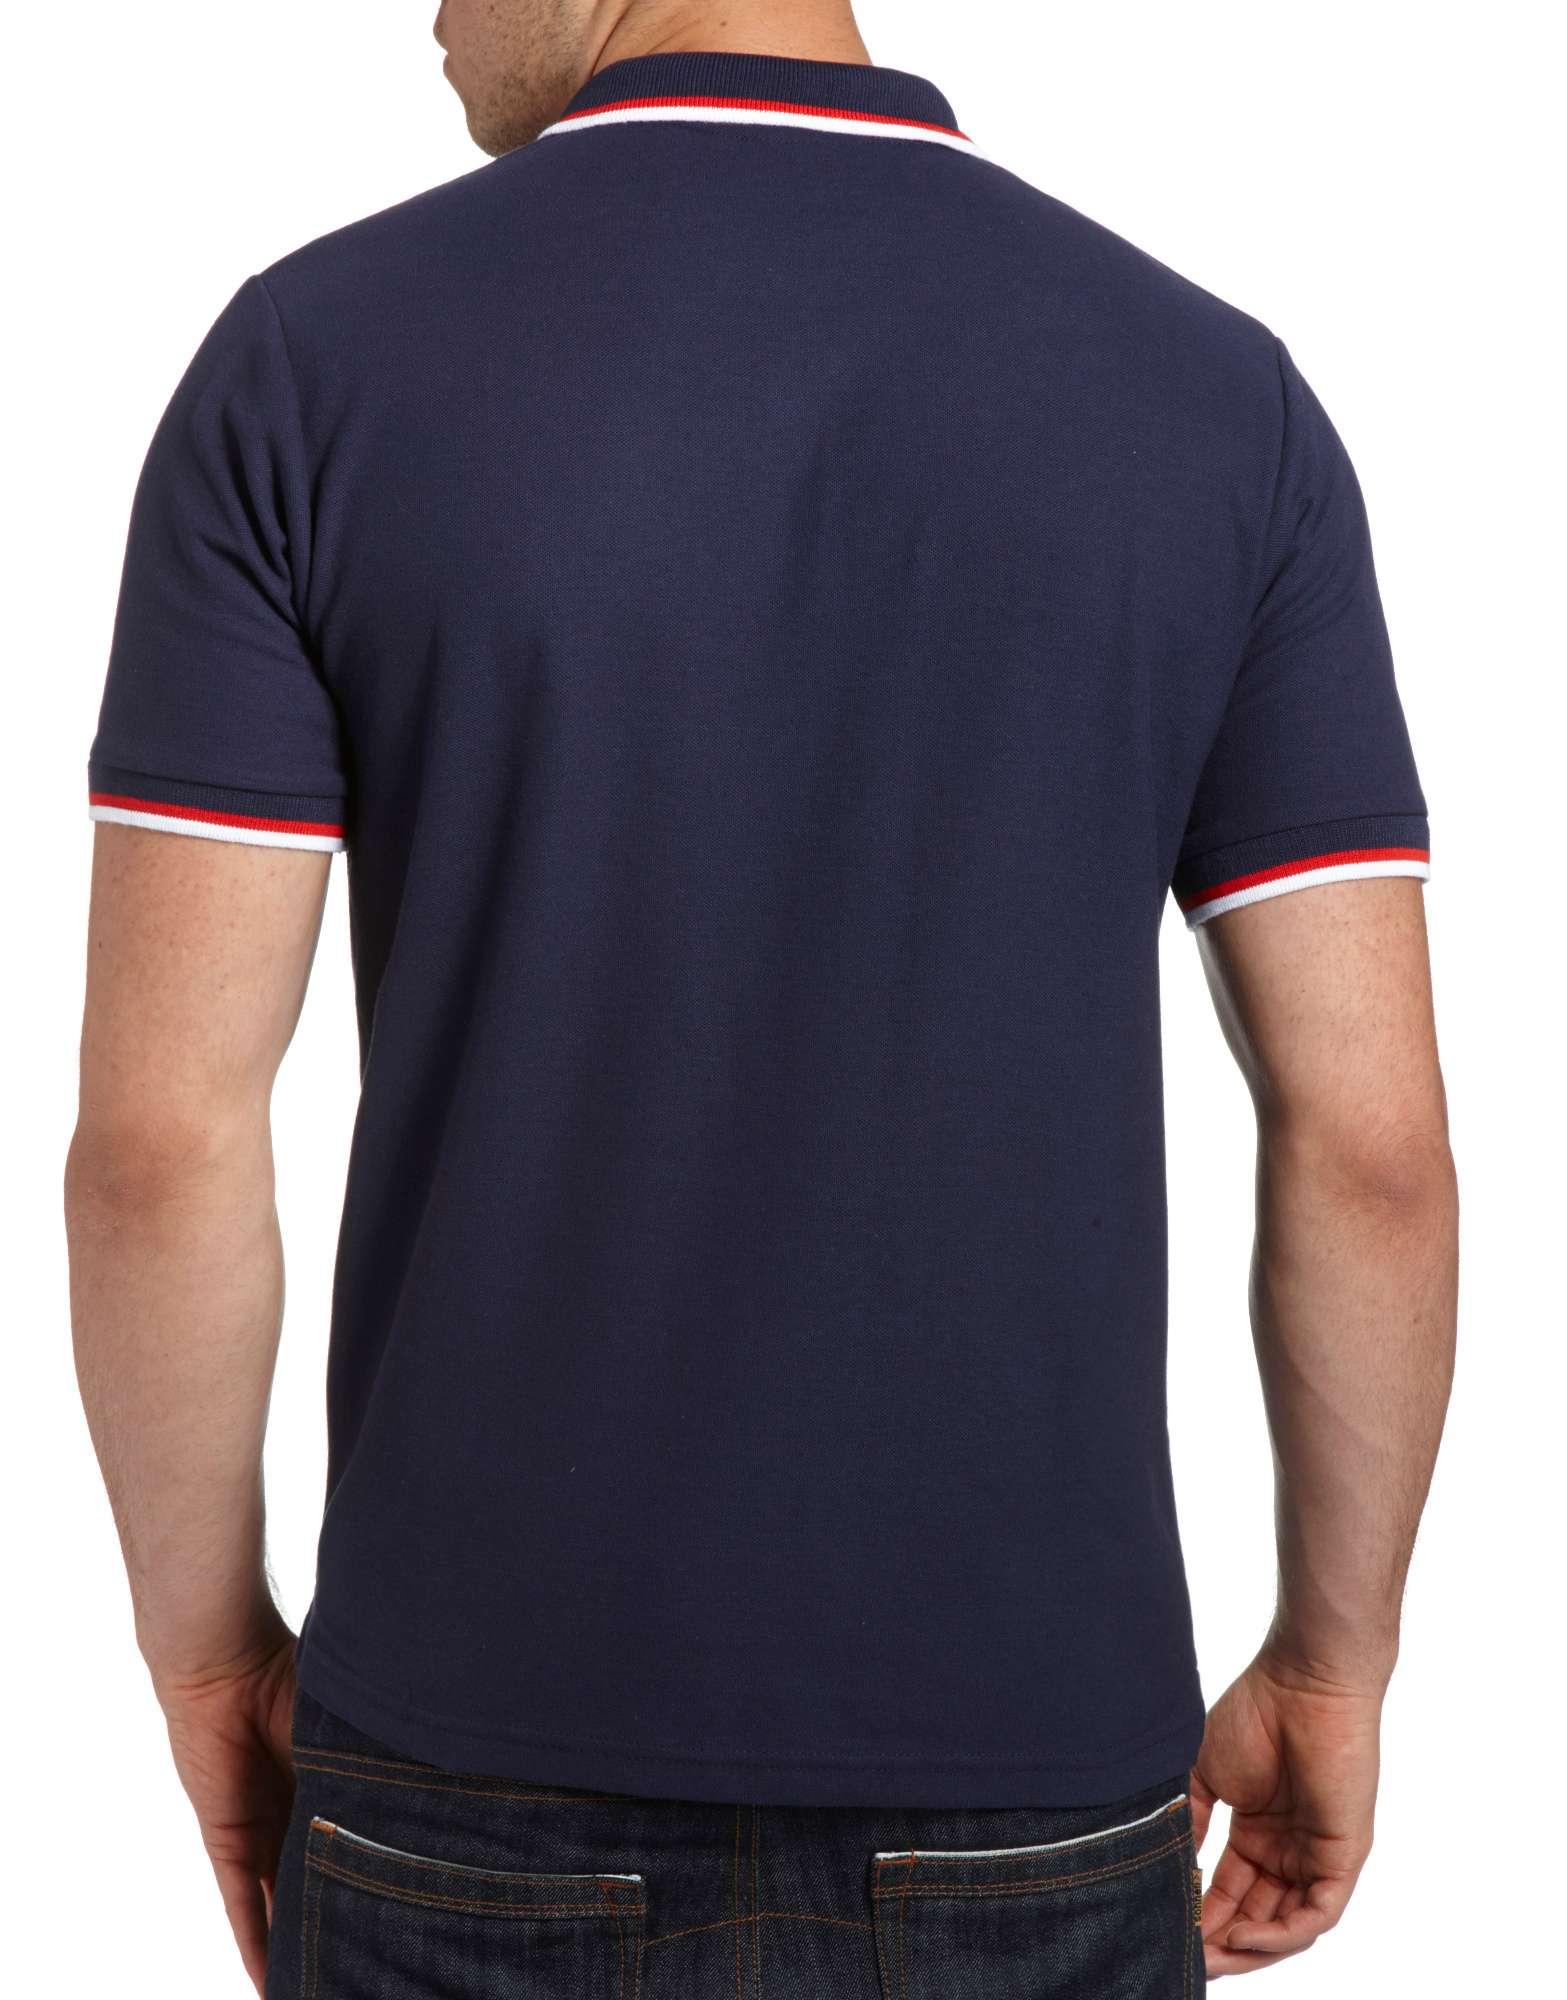 Official Team Arsenal Polo Shirt